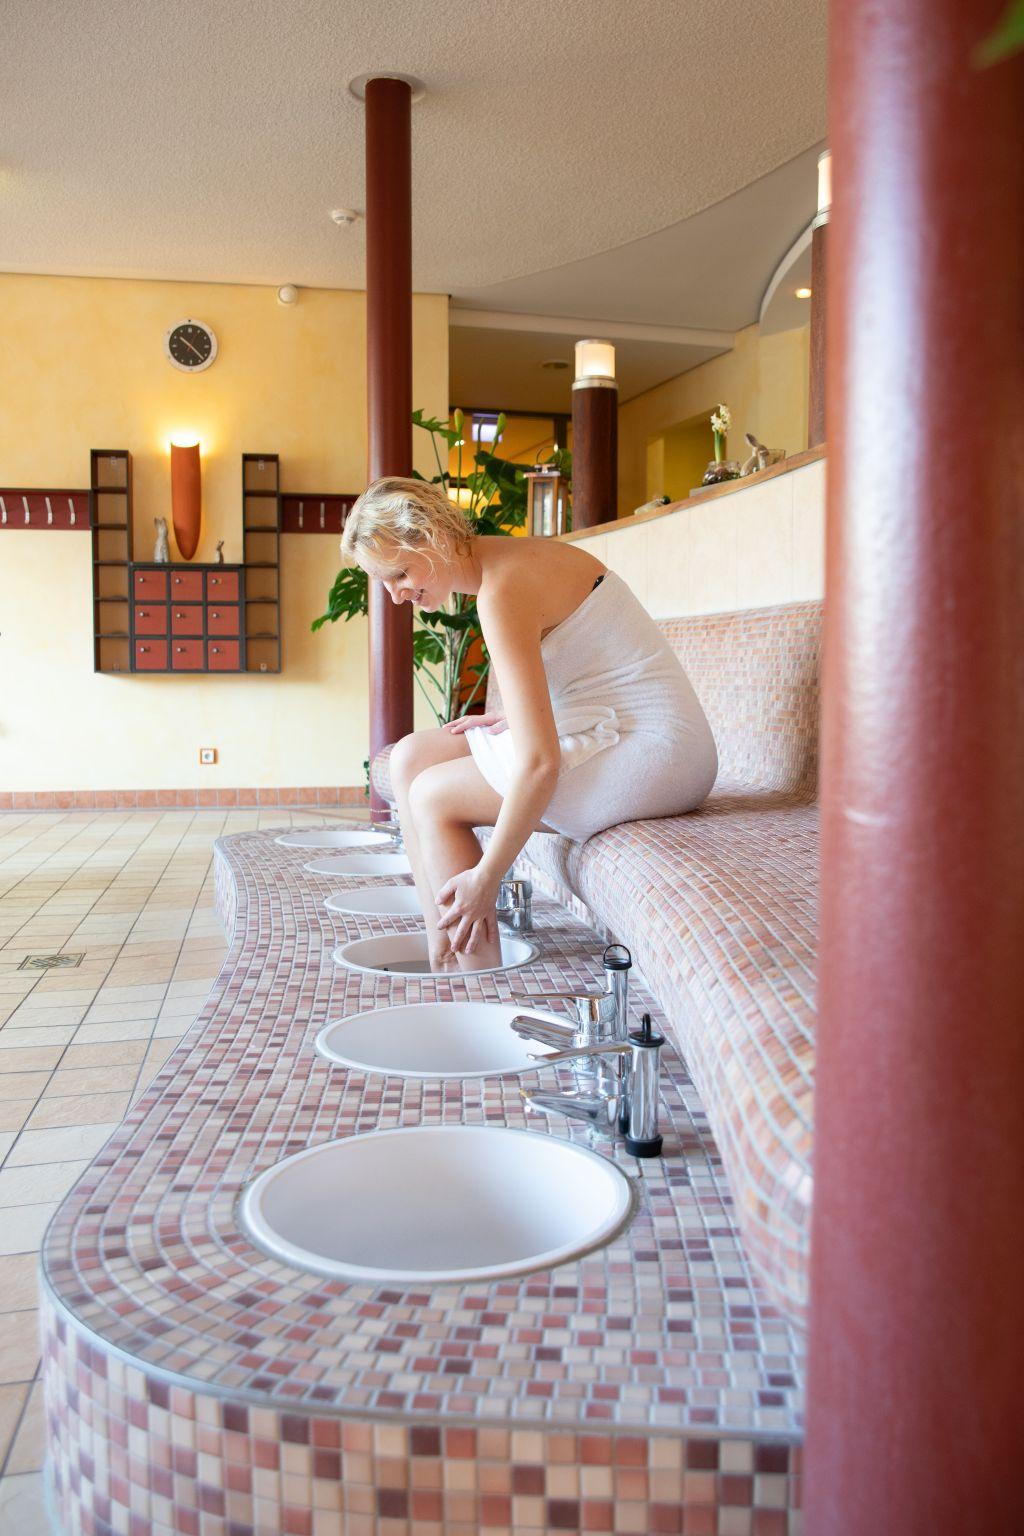 saunalandschaft-im-heidjers-wohl.jpg